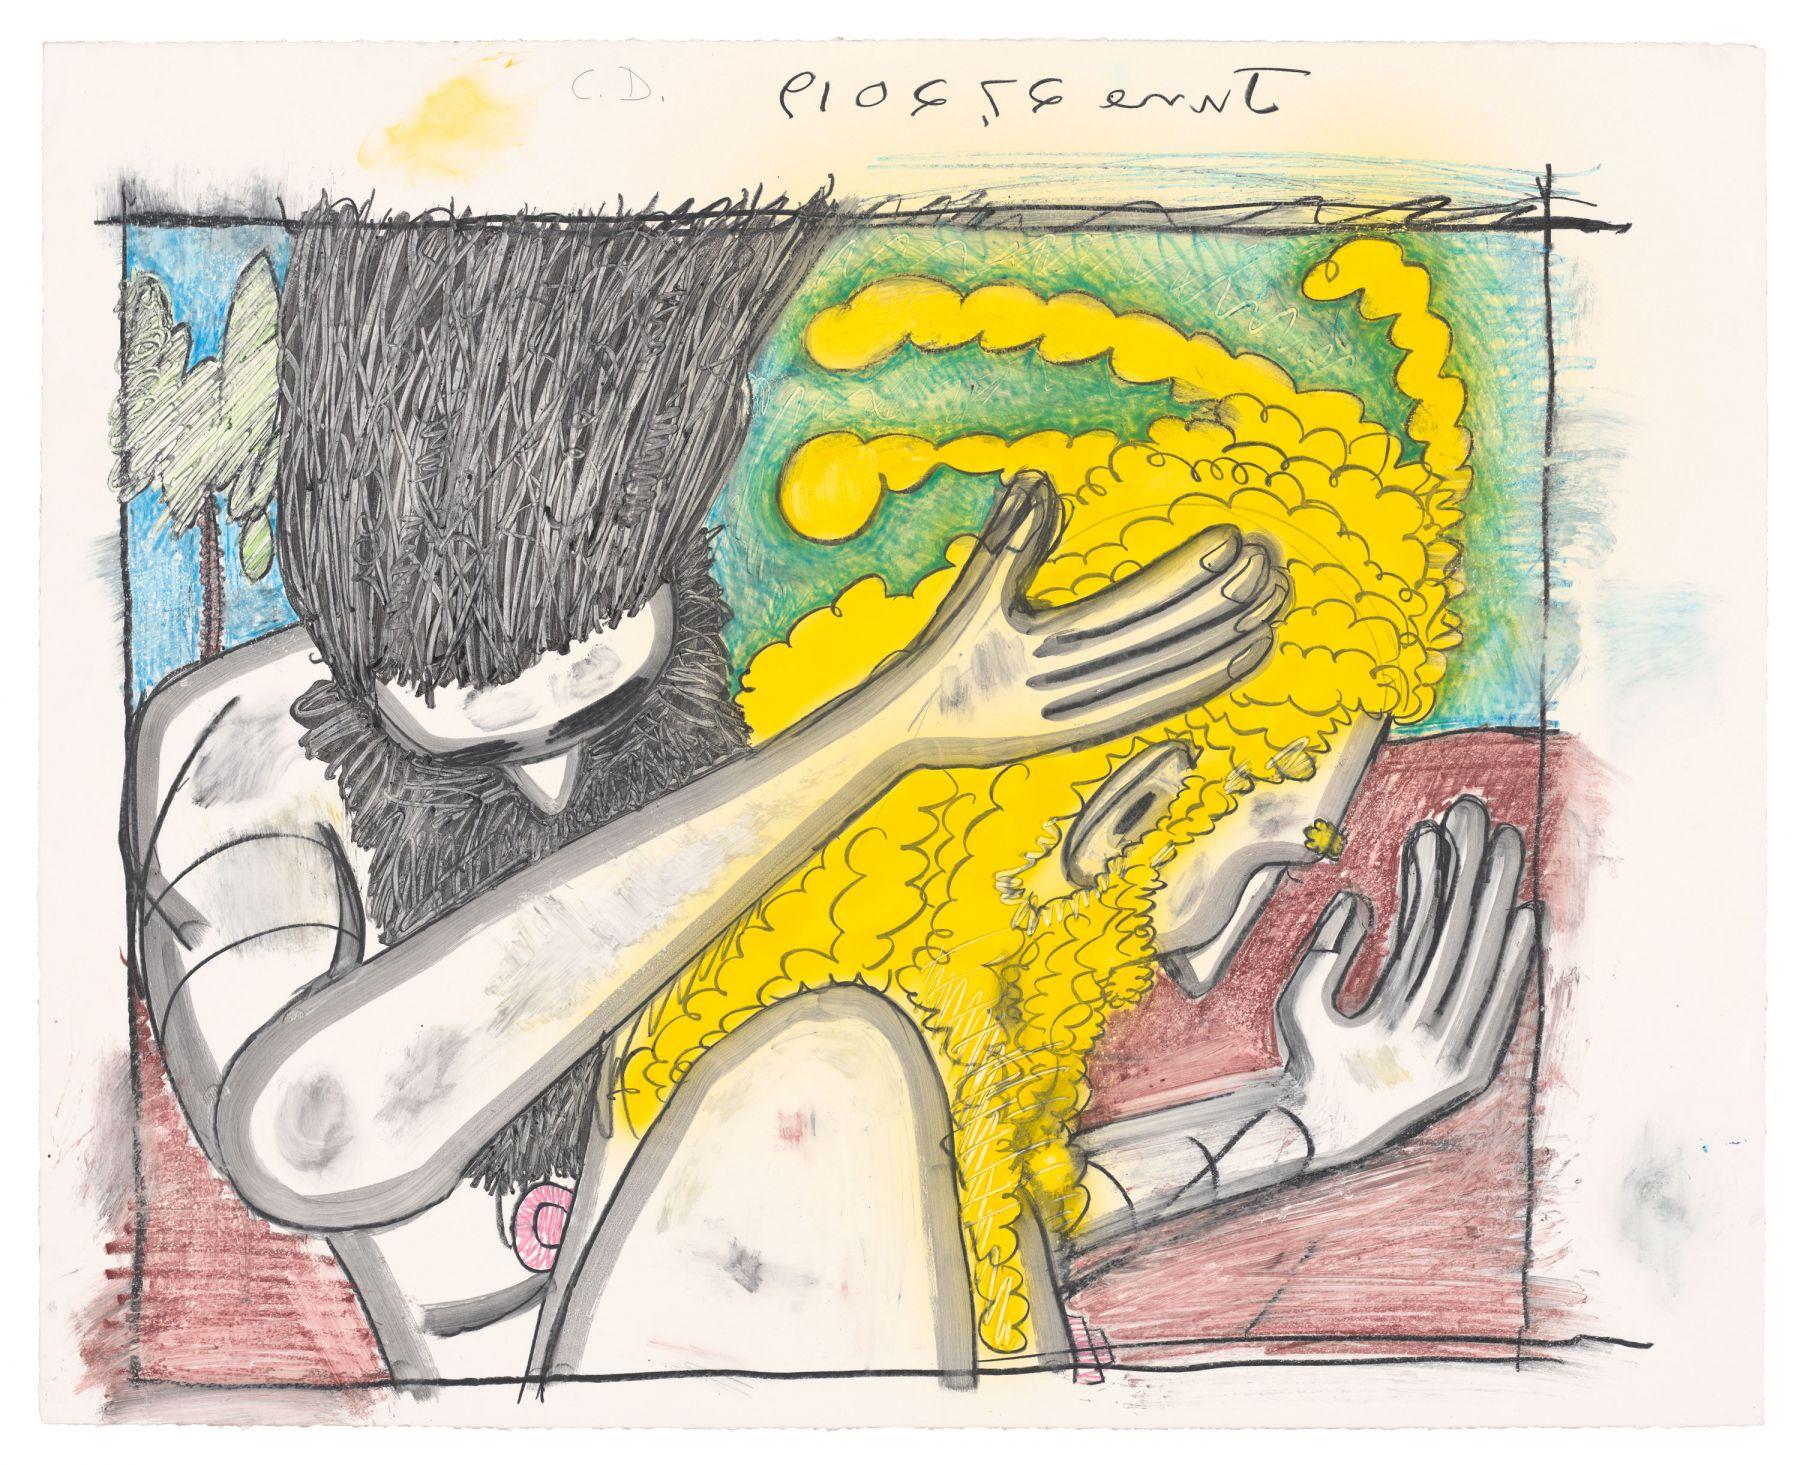 Large artwork image